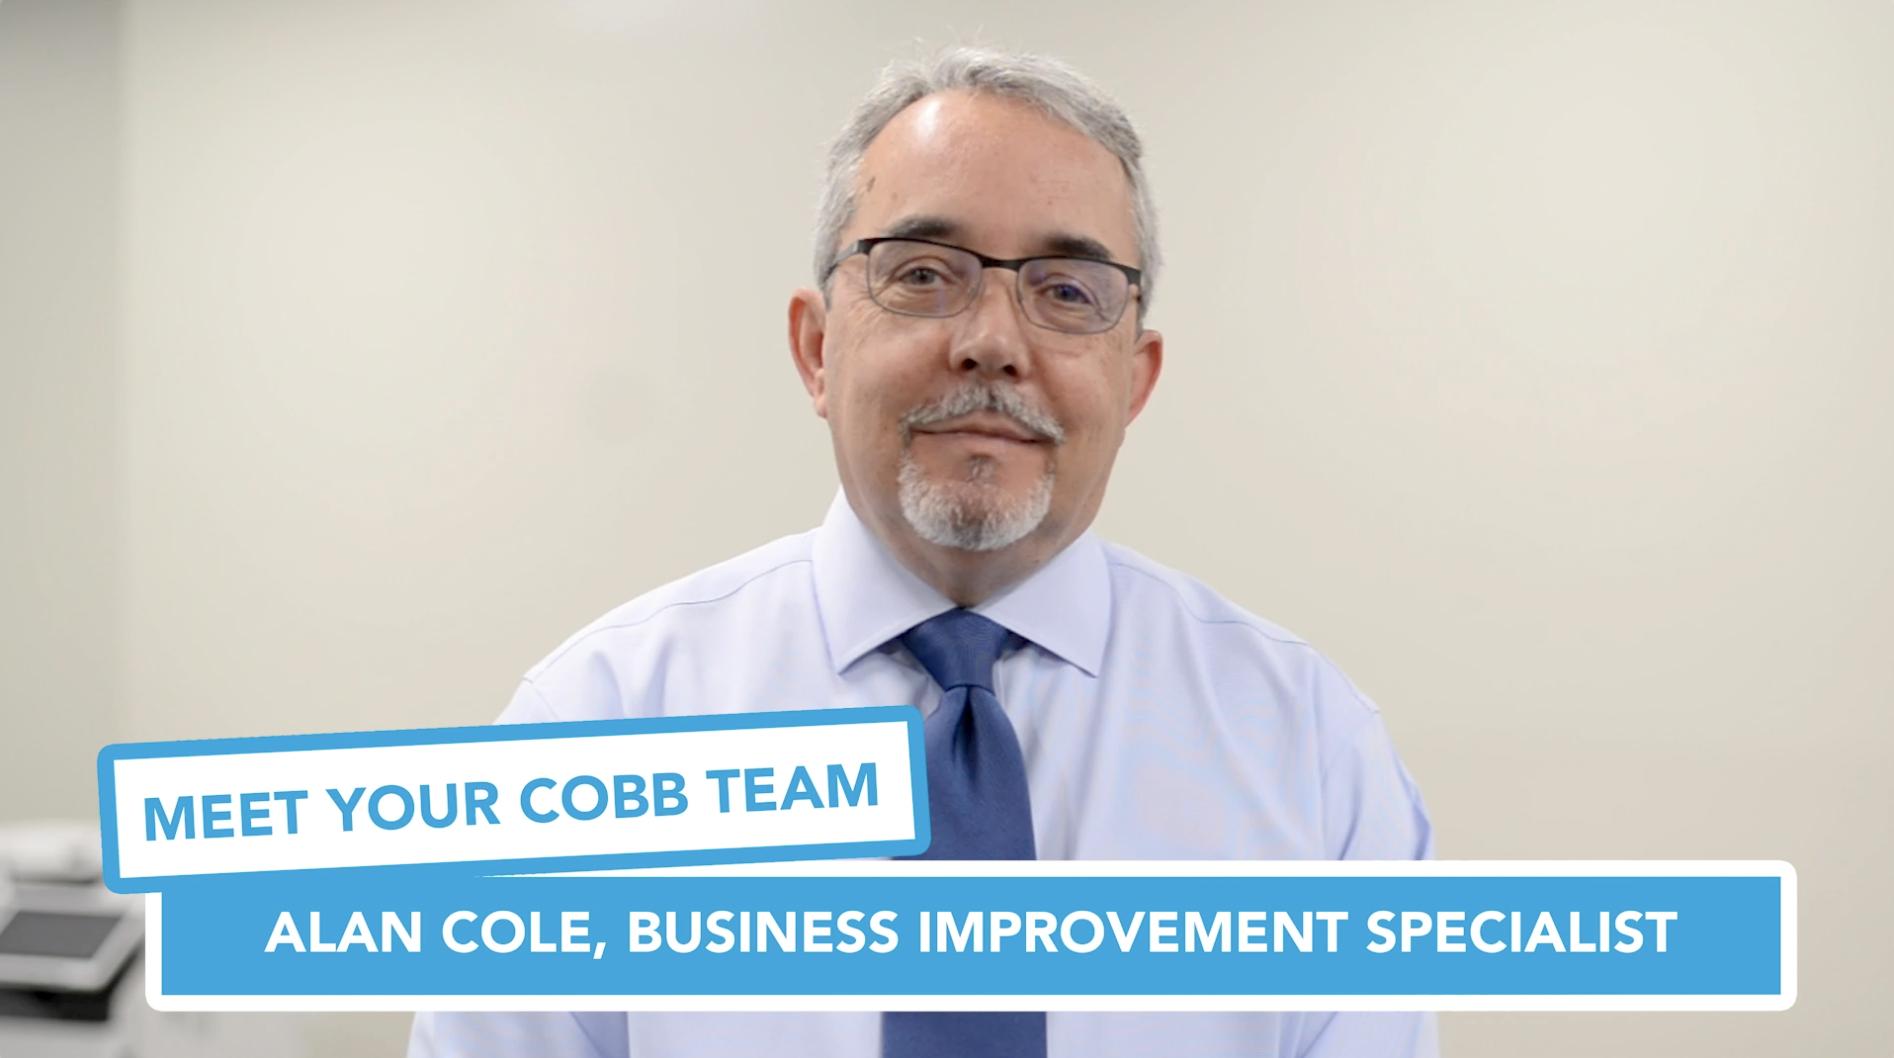 Meet Your Cobb Team Alan Cole, Senior Business Improvement Specialist